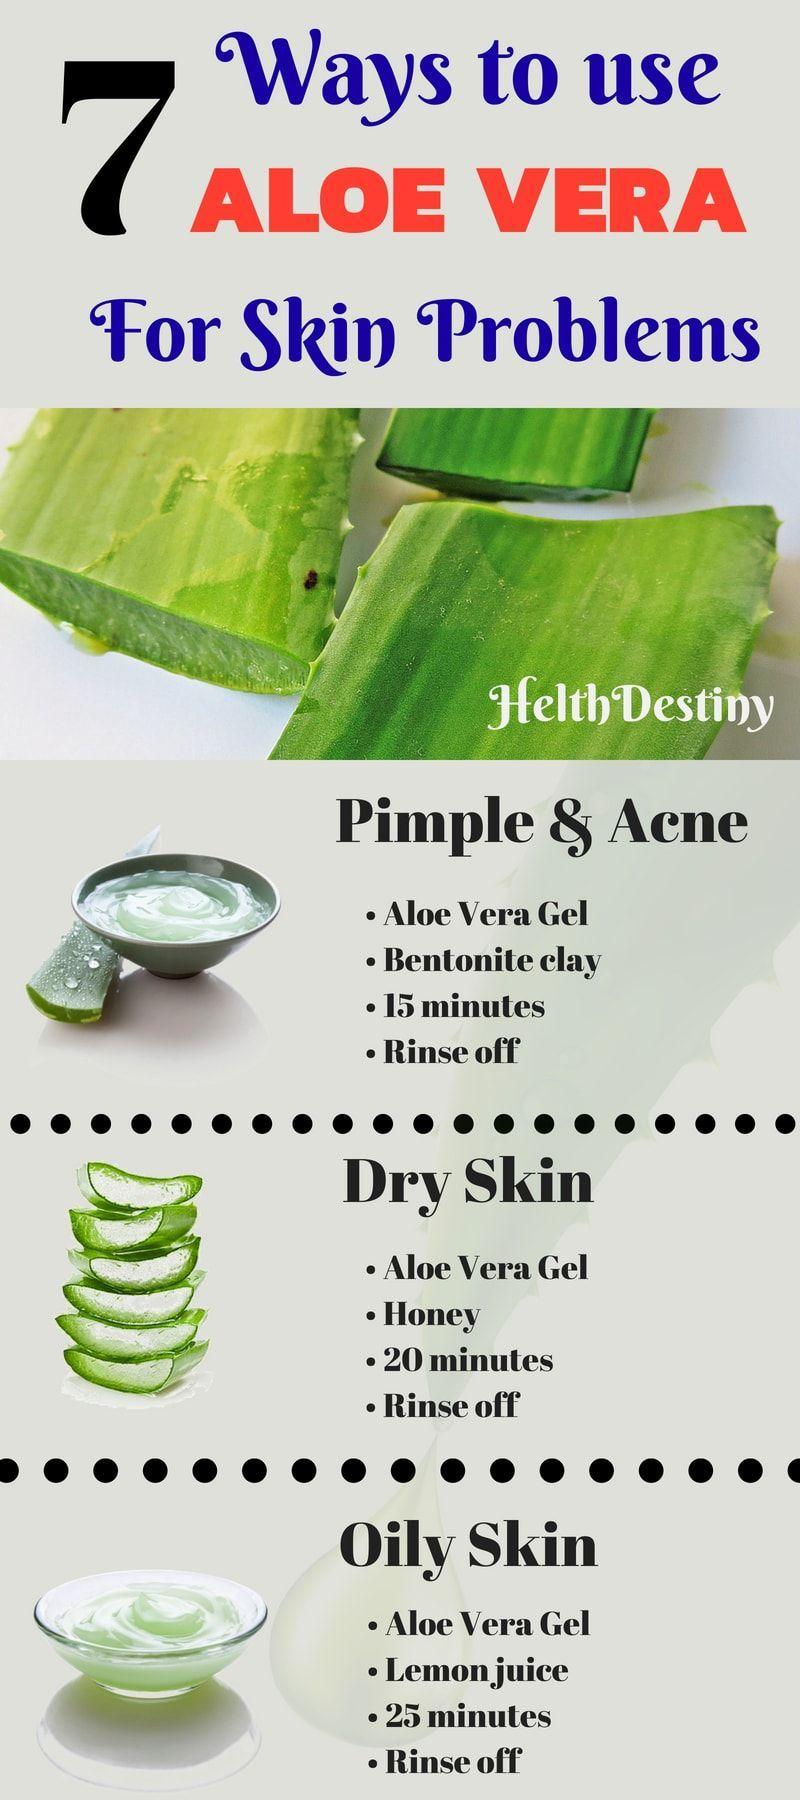 Pin By Candace Fisher On Vaselina Aloe Vera Skin Care Aloe Vera Benefits Aloe Vera For Skin